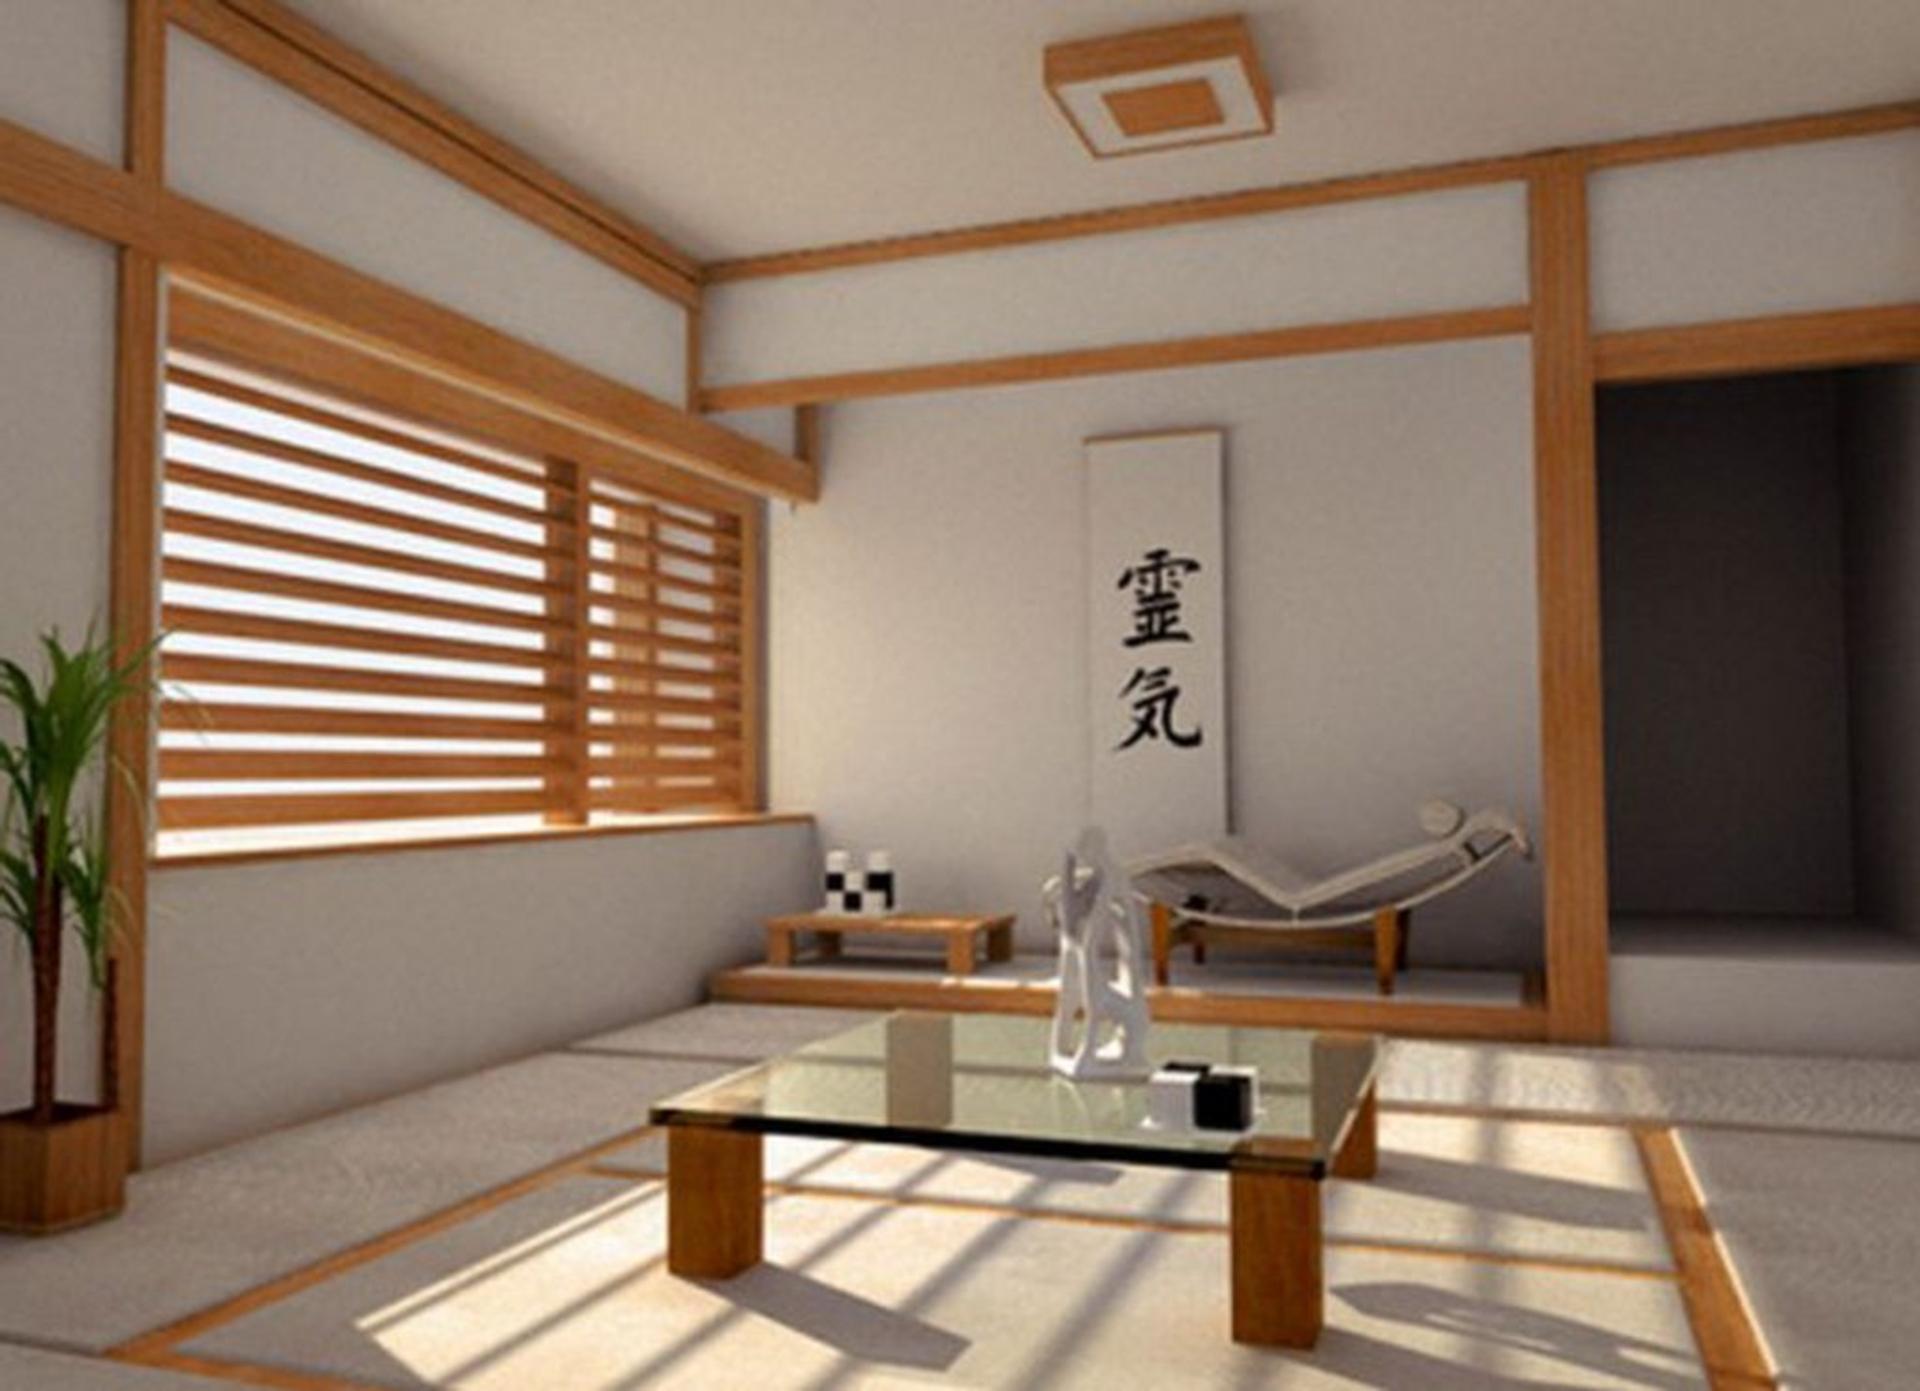 japanese small house interior design photo - 4